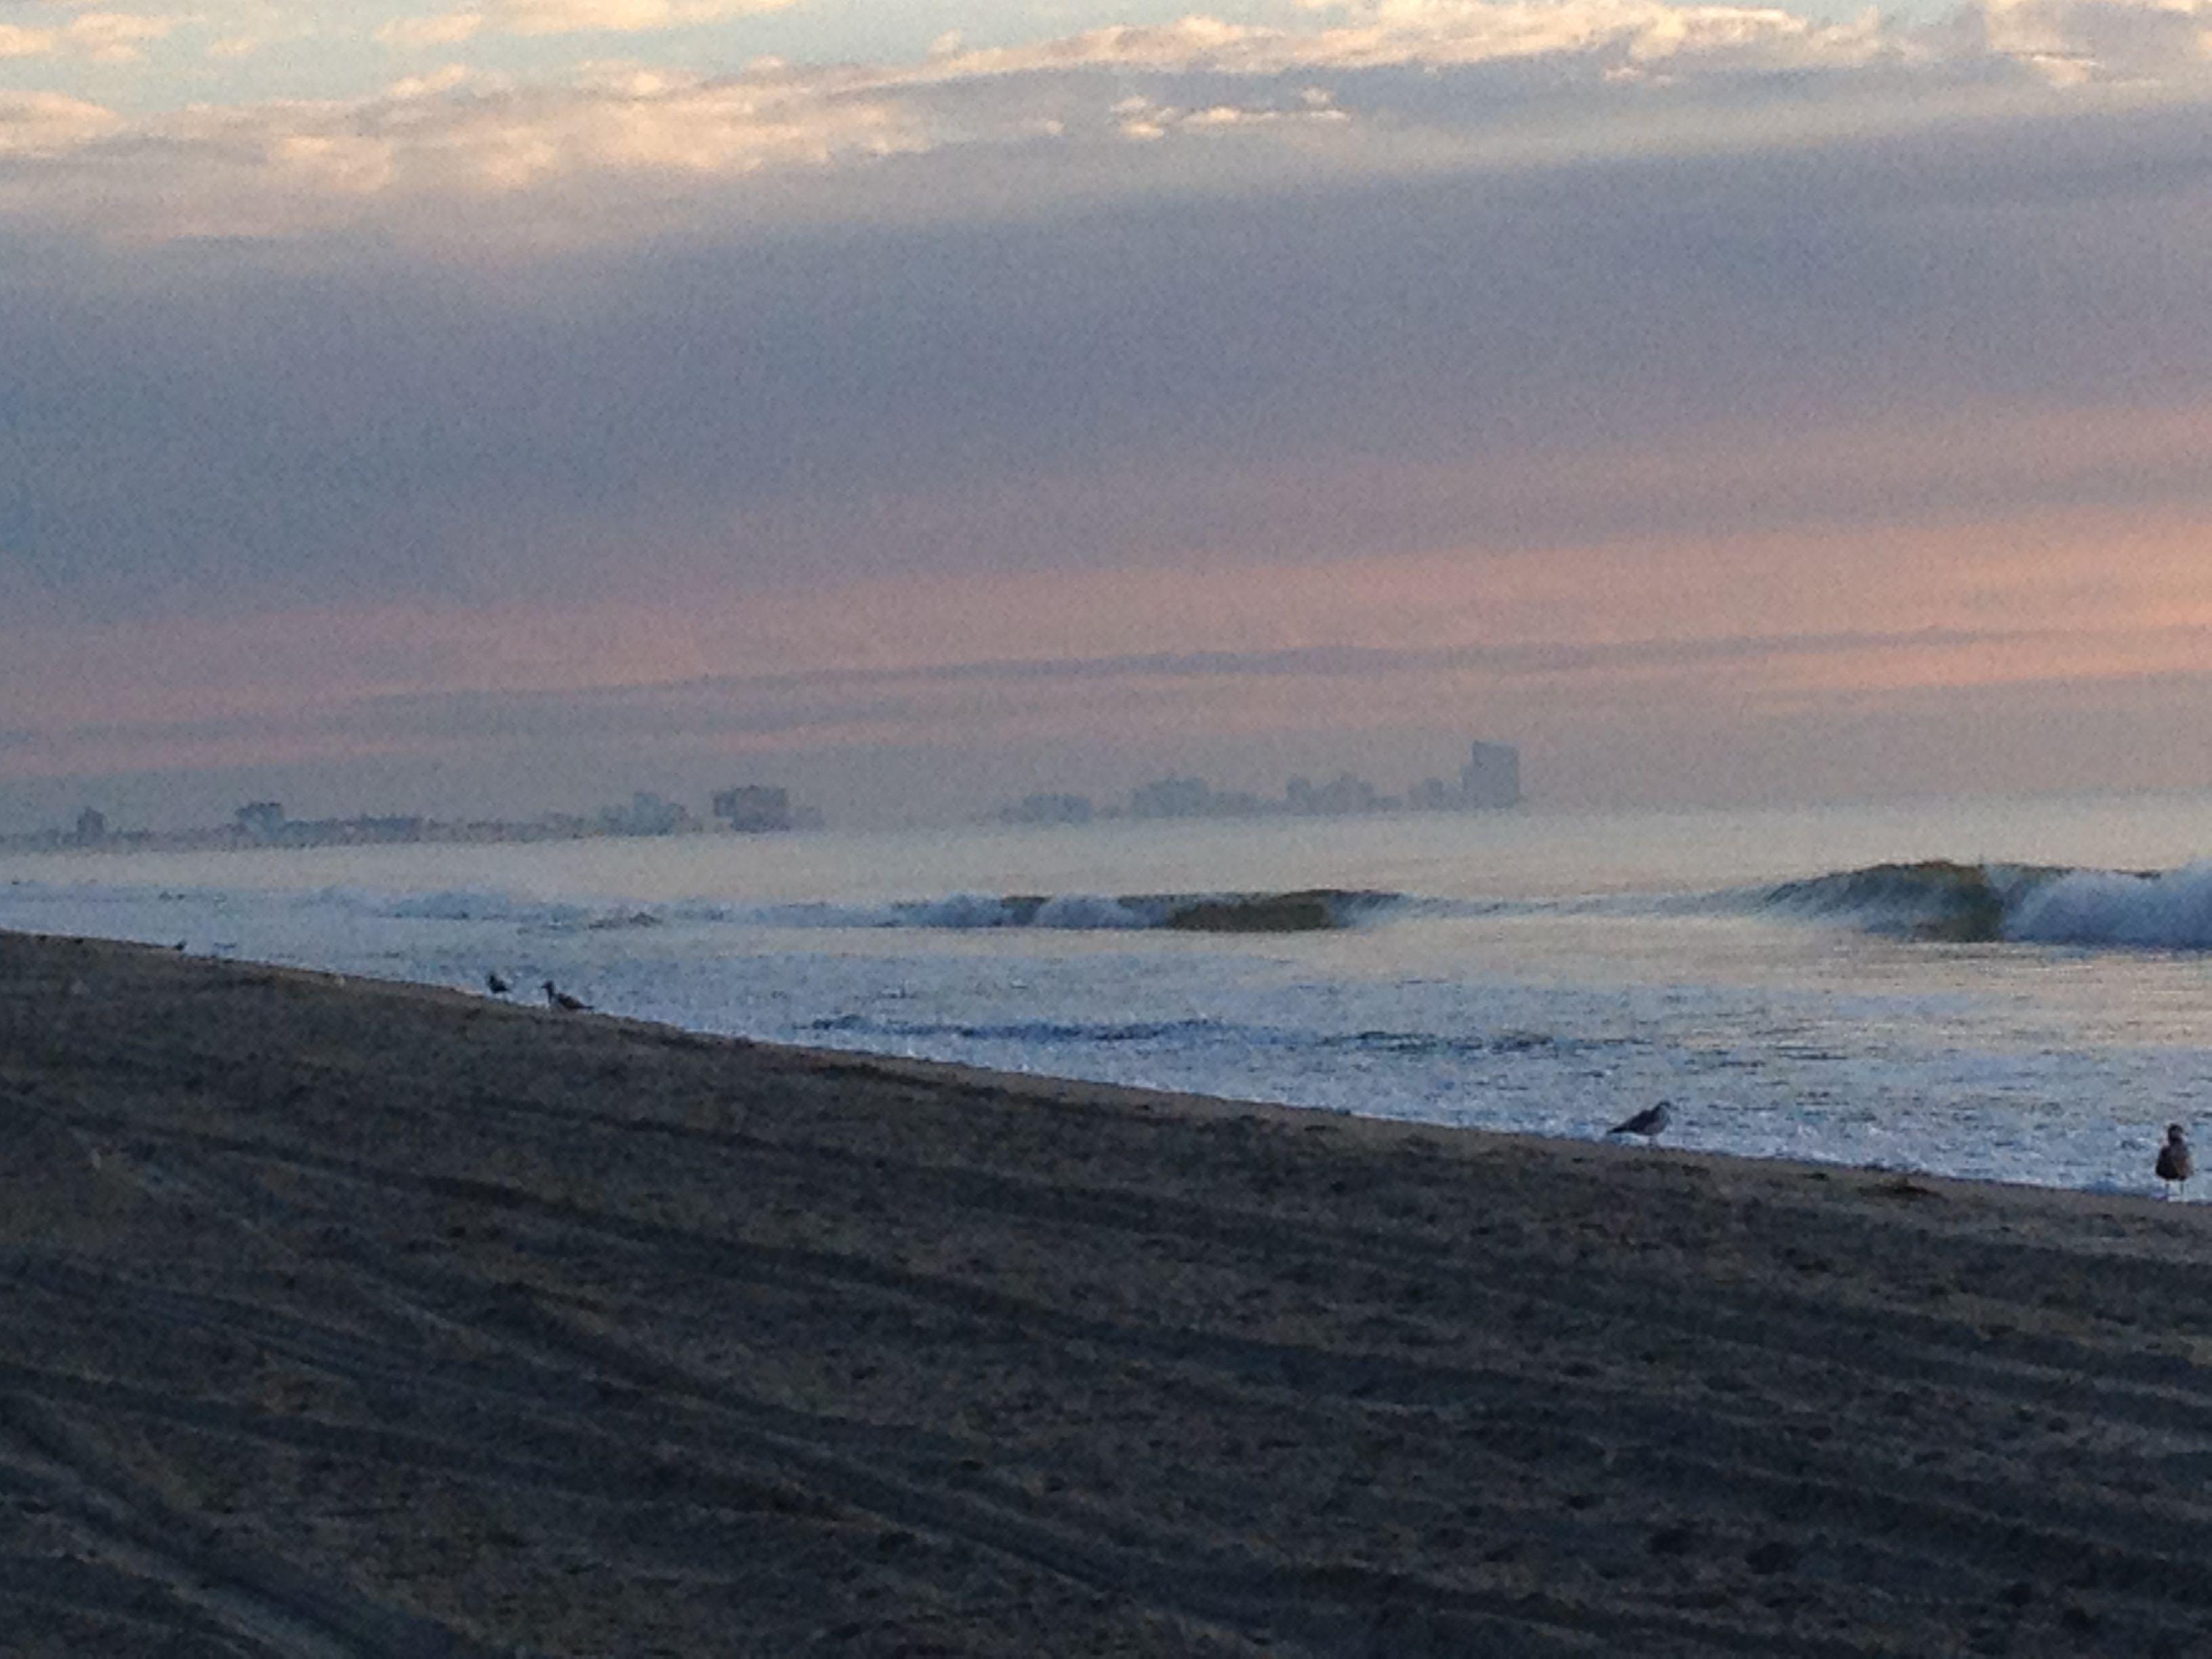 View of Atlantic City from Ocean City